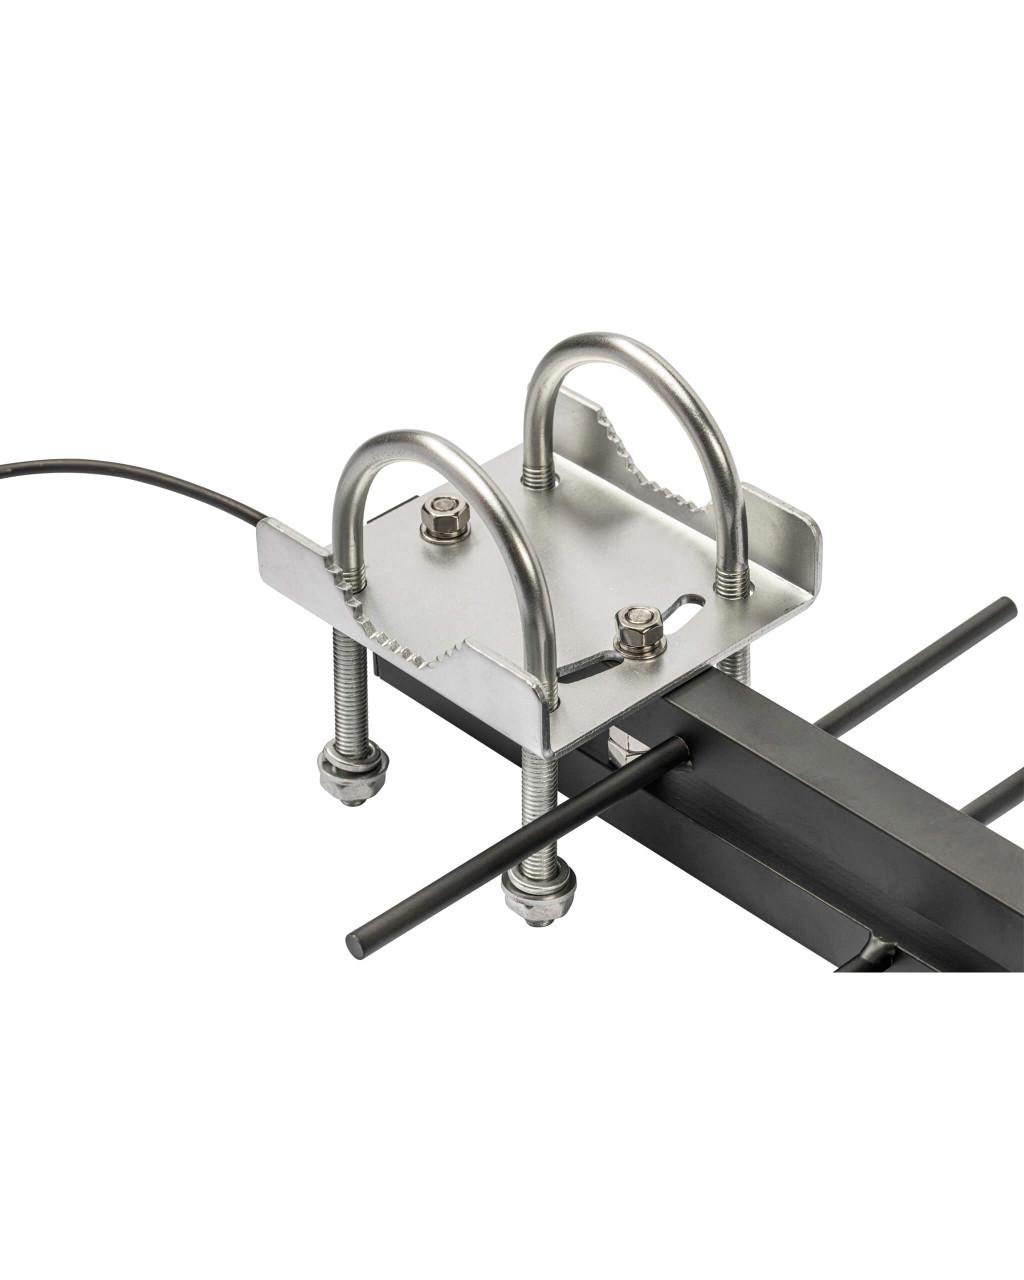 The Arrow - LPDA Cellular Antenna N-Female 698-2700 MHz